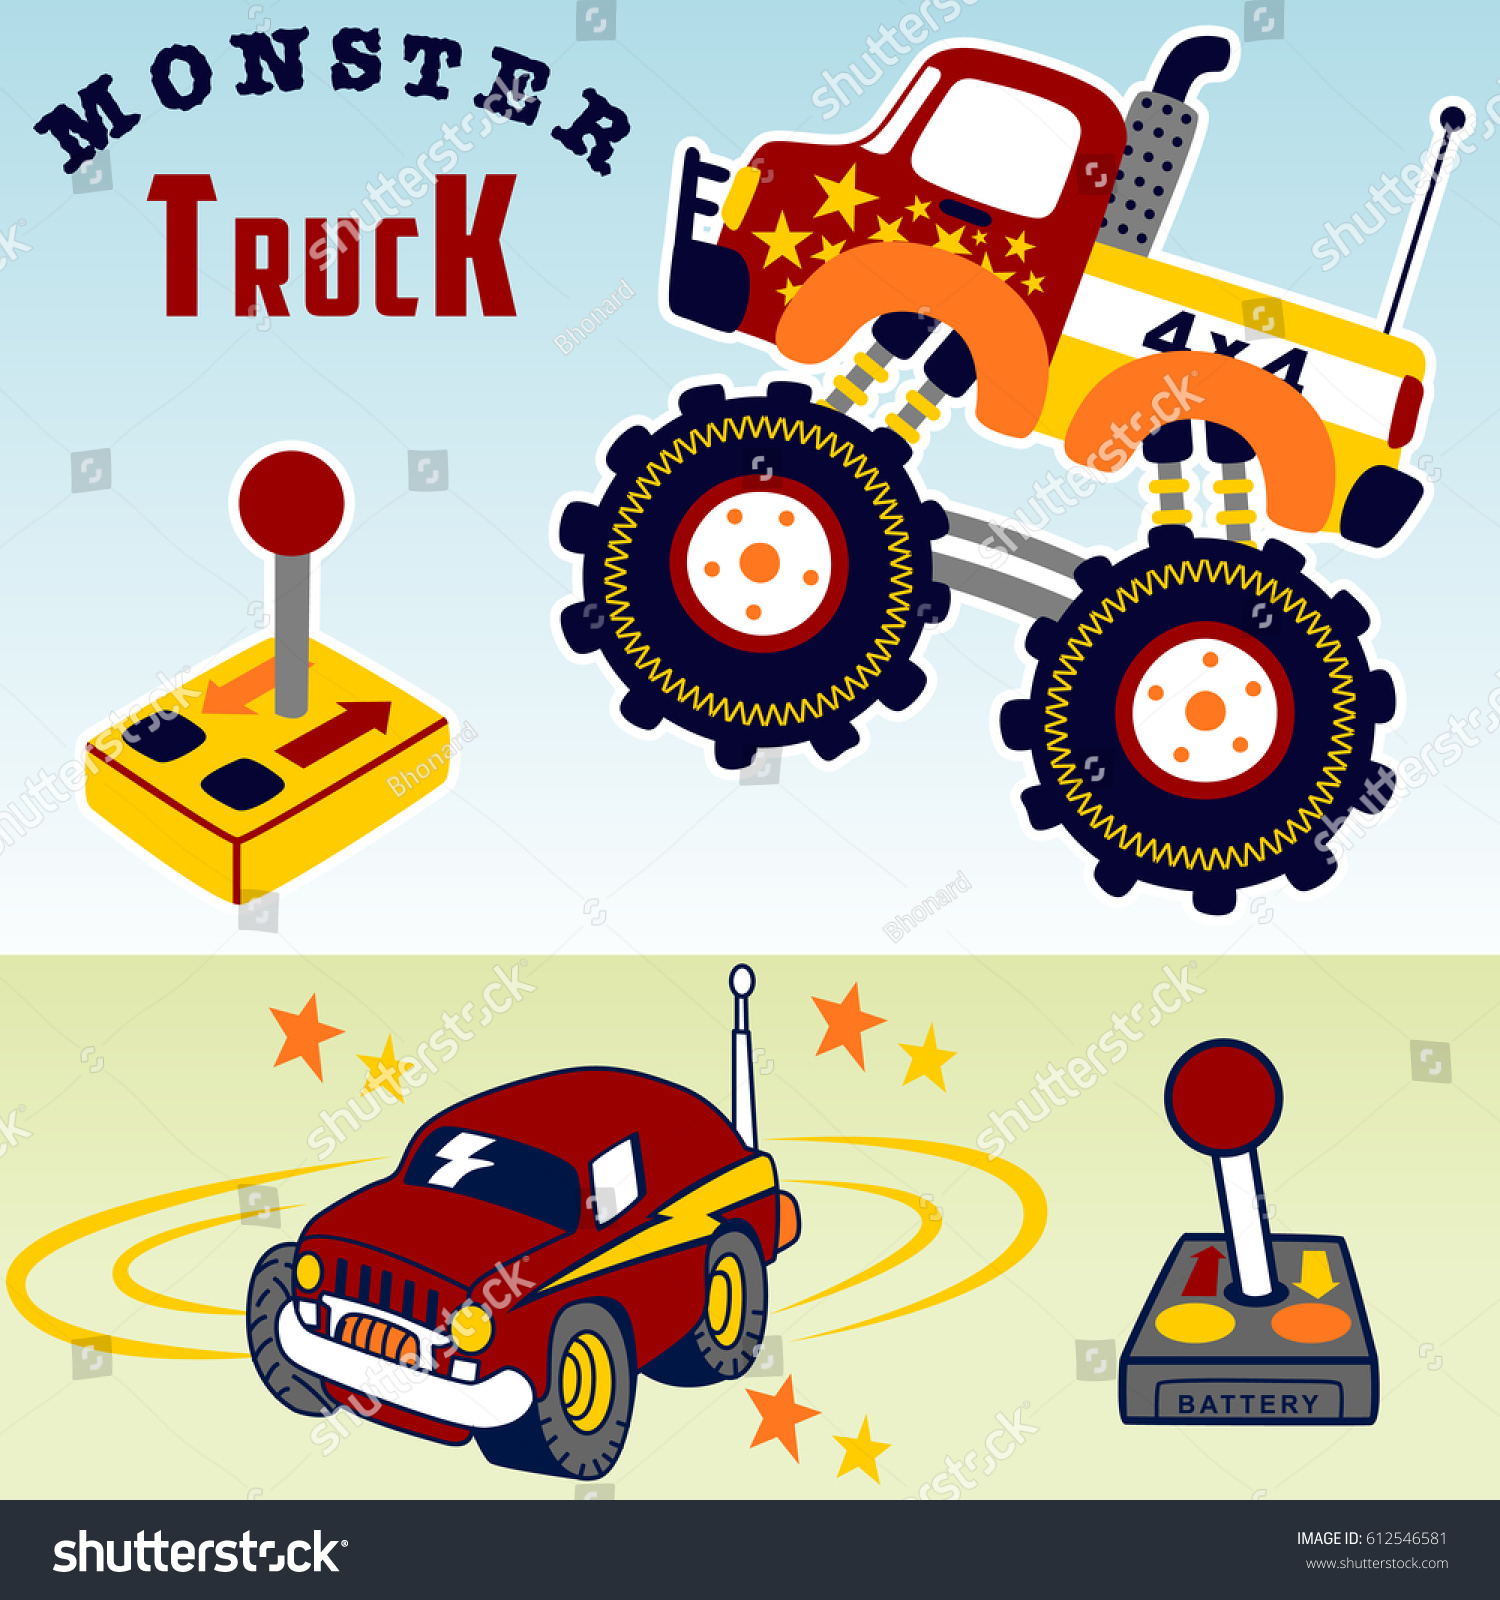 Kids Toys Kids T Shirt Design Stock Vector Royalty Free 612546581